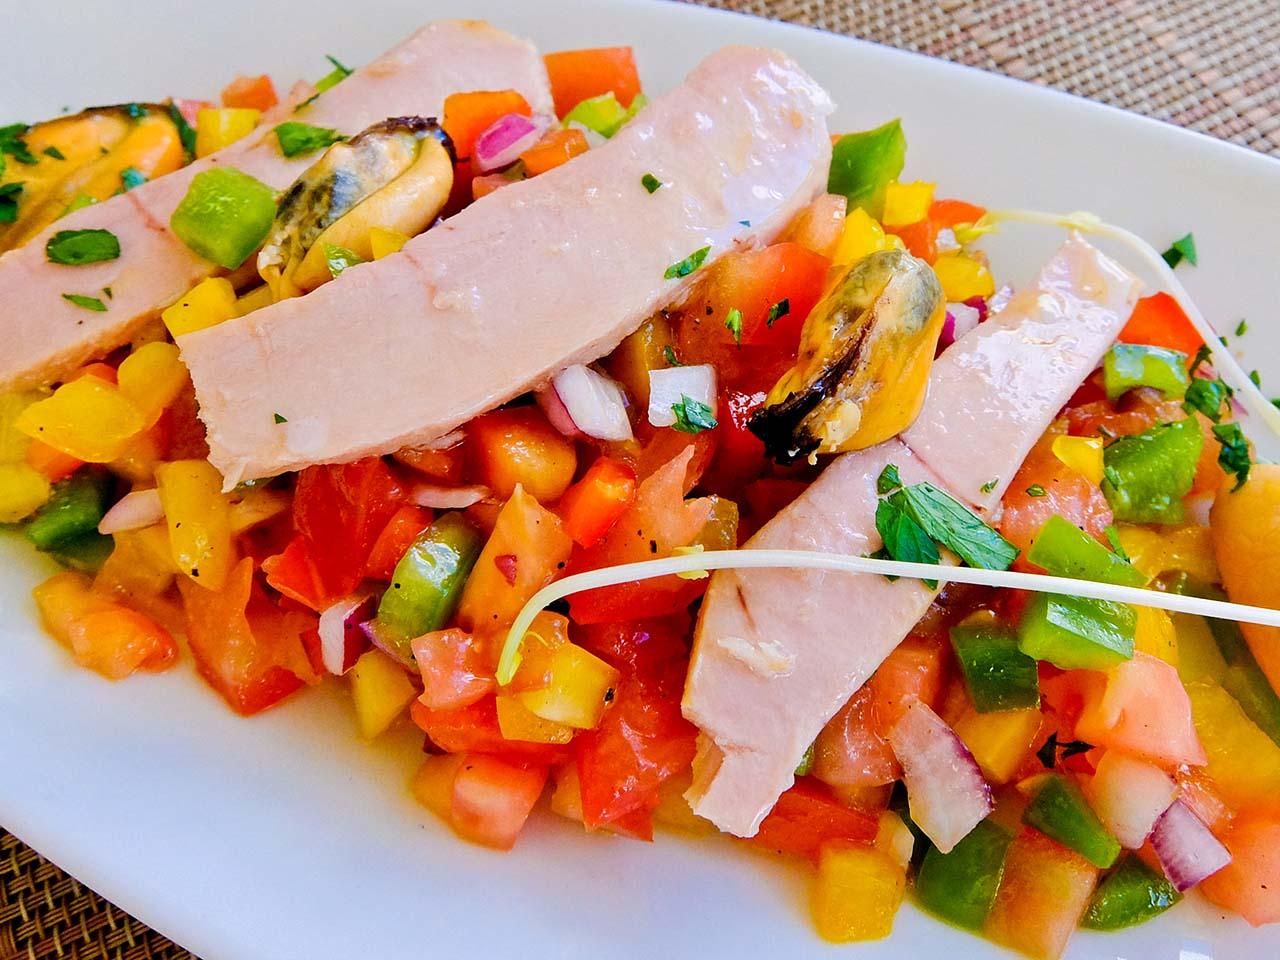 Mallorca Food - Trampó with Seafood